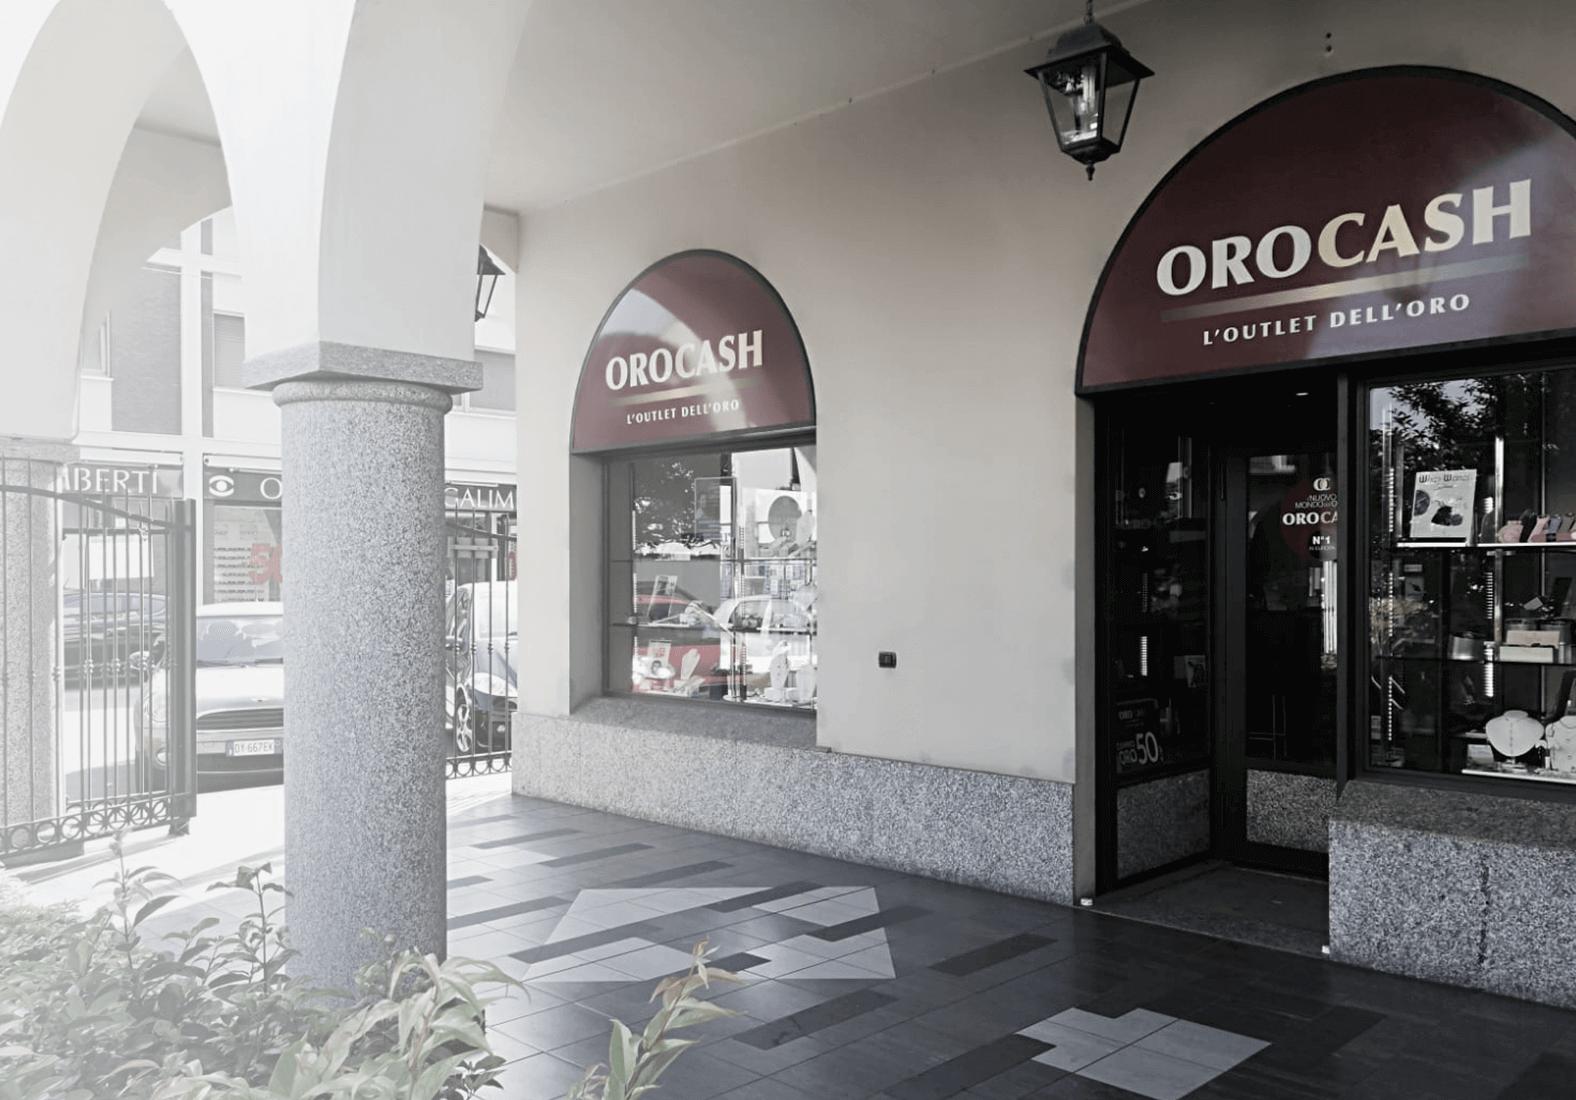 Oltre 300 negozi in Europa